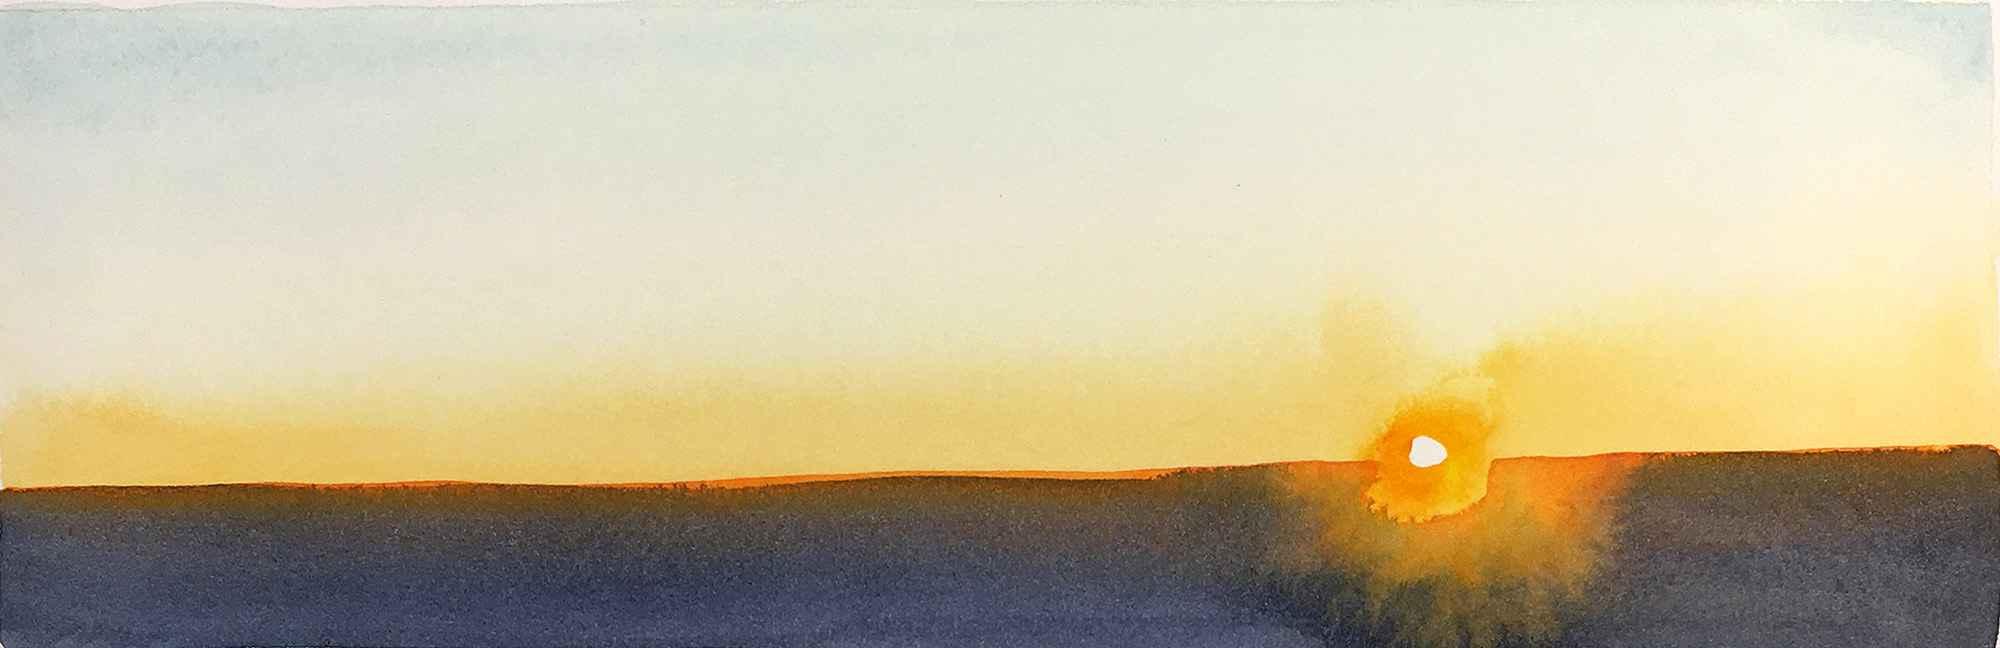 When the Sun Appears ... by  Lisa Grossman - Masterpiece Online